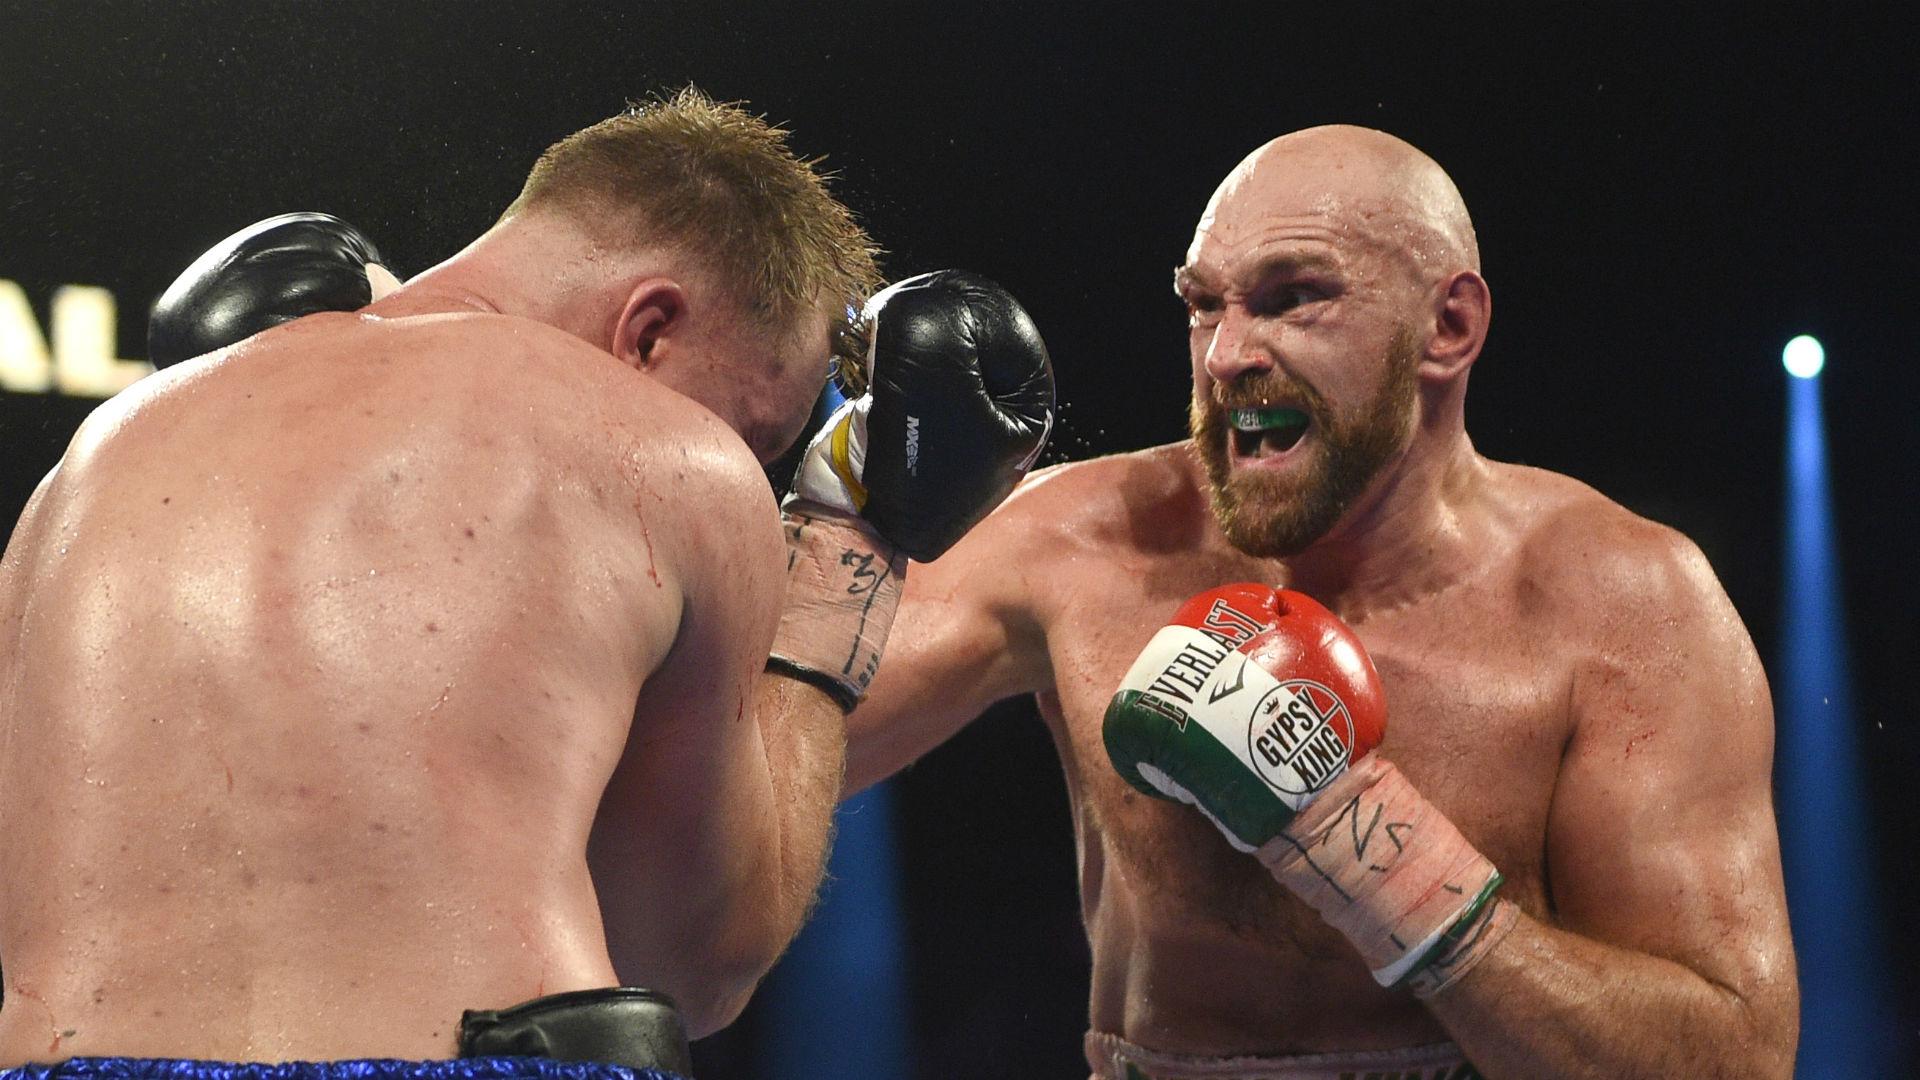 Fury names Javan 'Sugar' Hill as trainer ahead of anticipated Wilder rematch